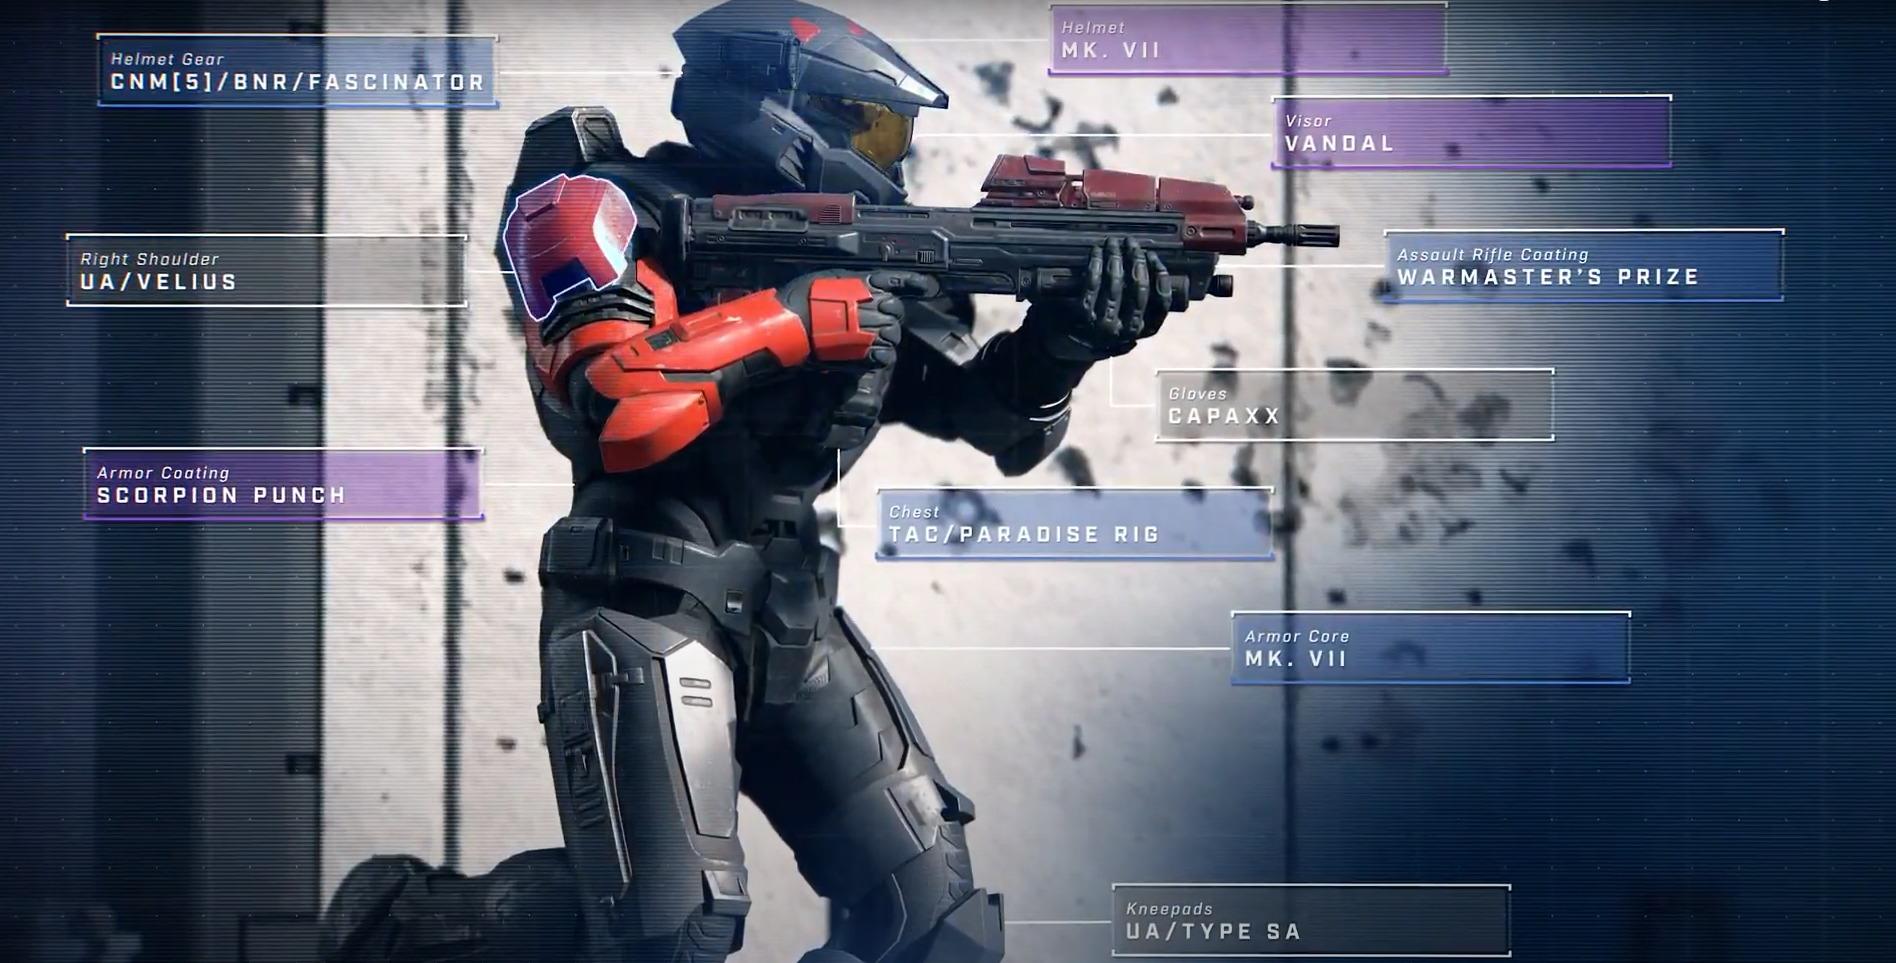 Halo Infinite's armor customization options